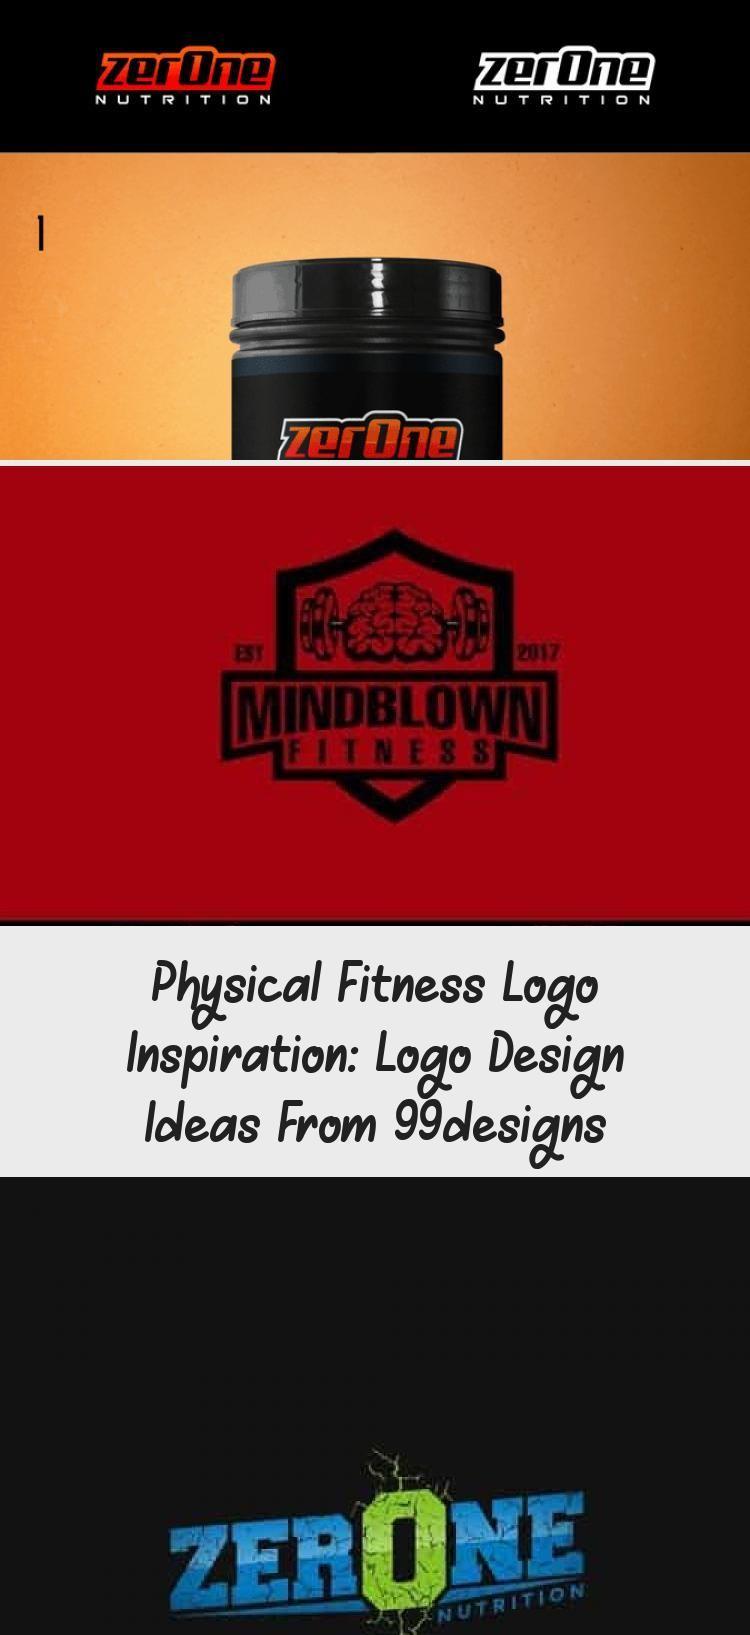 Physical Fitness Logo Inspiration: Logo Design Ideas from 99designs #logodesignT... -  Physical Fitn...